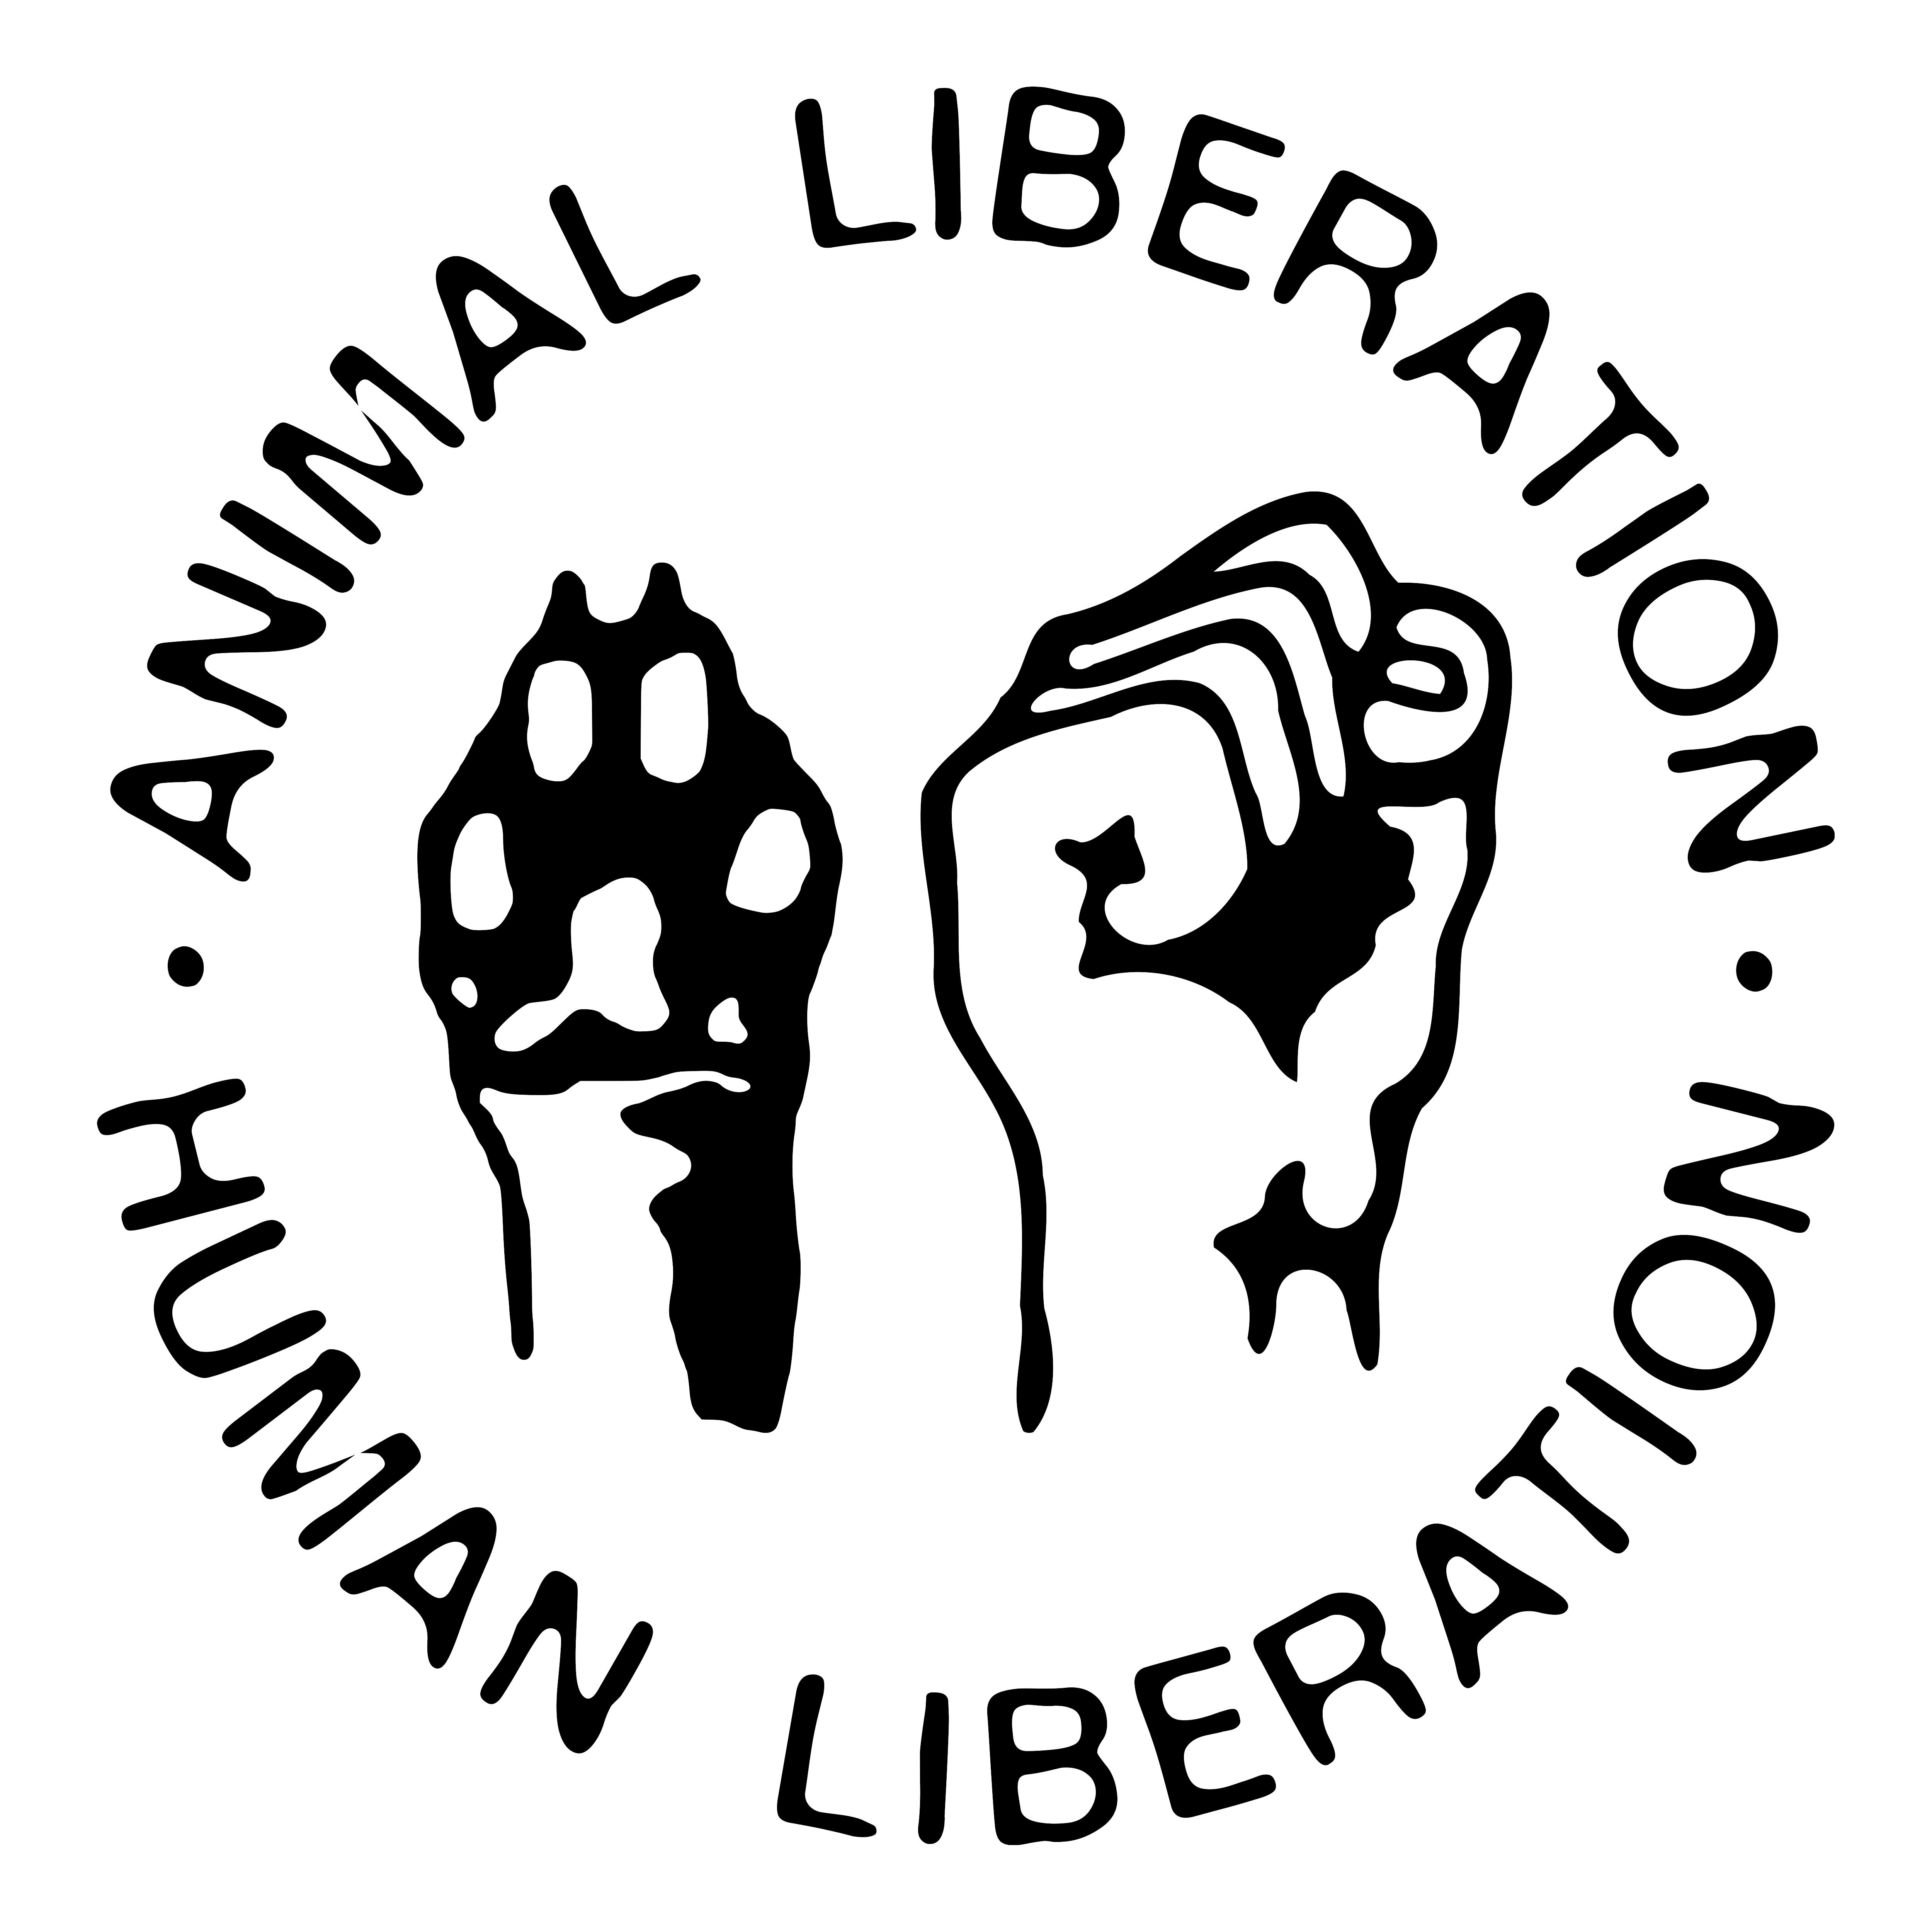 vegan symbol emojis copyright free clipart copypaste transparent png image file 5000px transparent png biocorpaavc Image collections